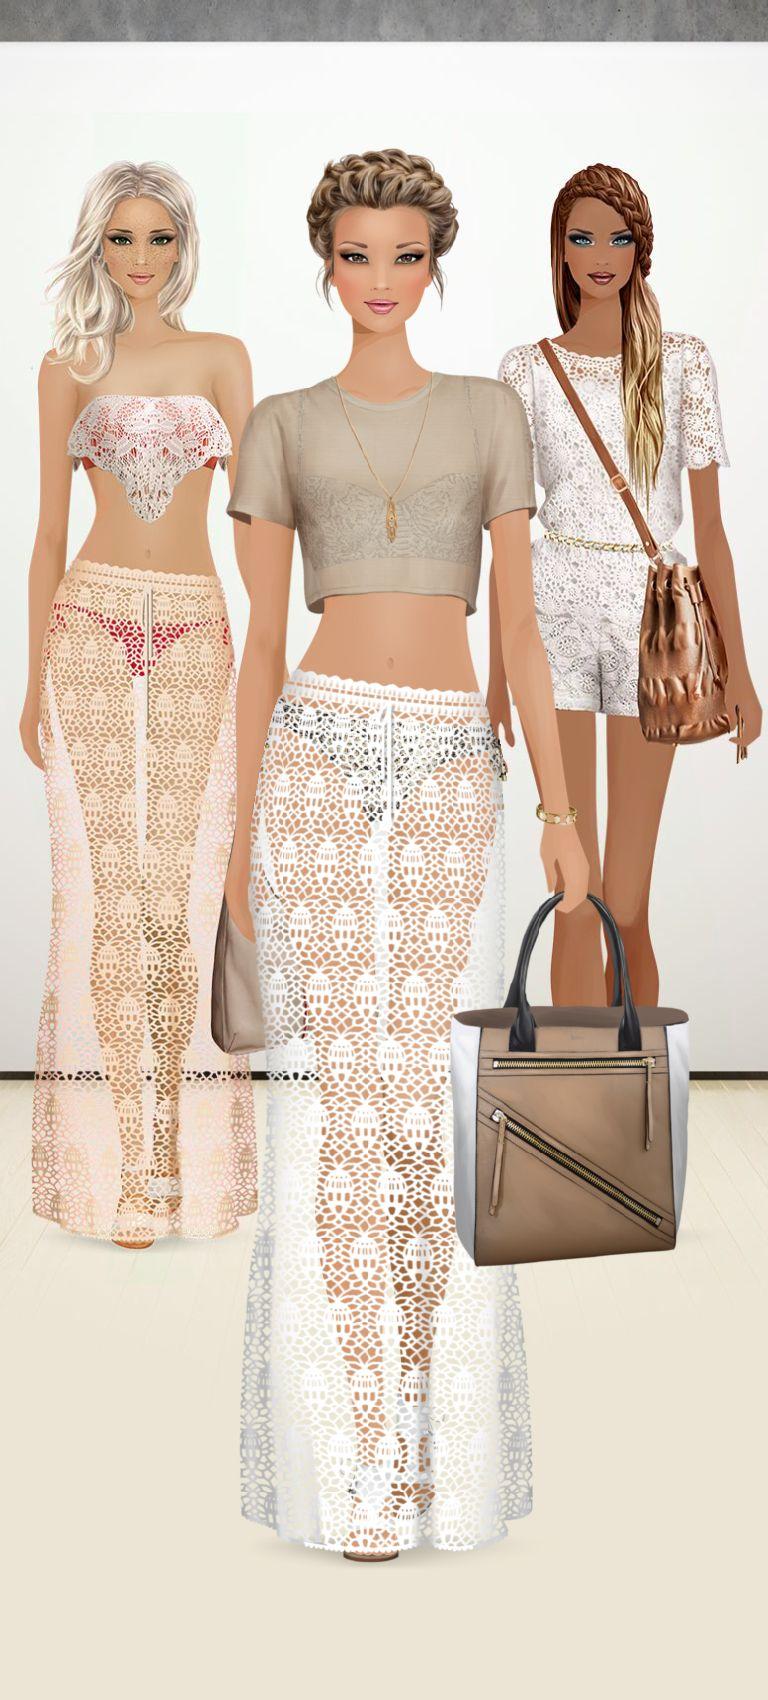 Fashion Game Desenhos De Moda Moda